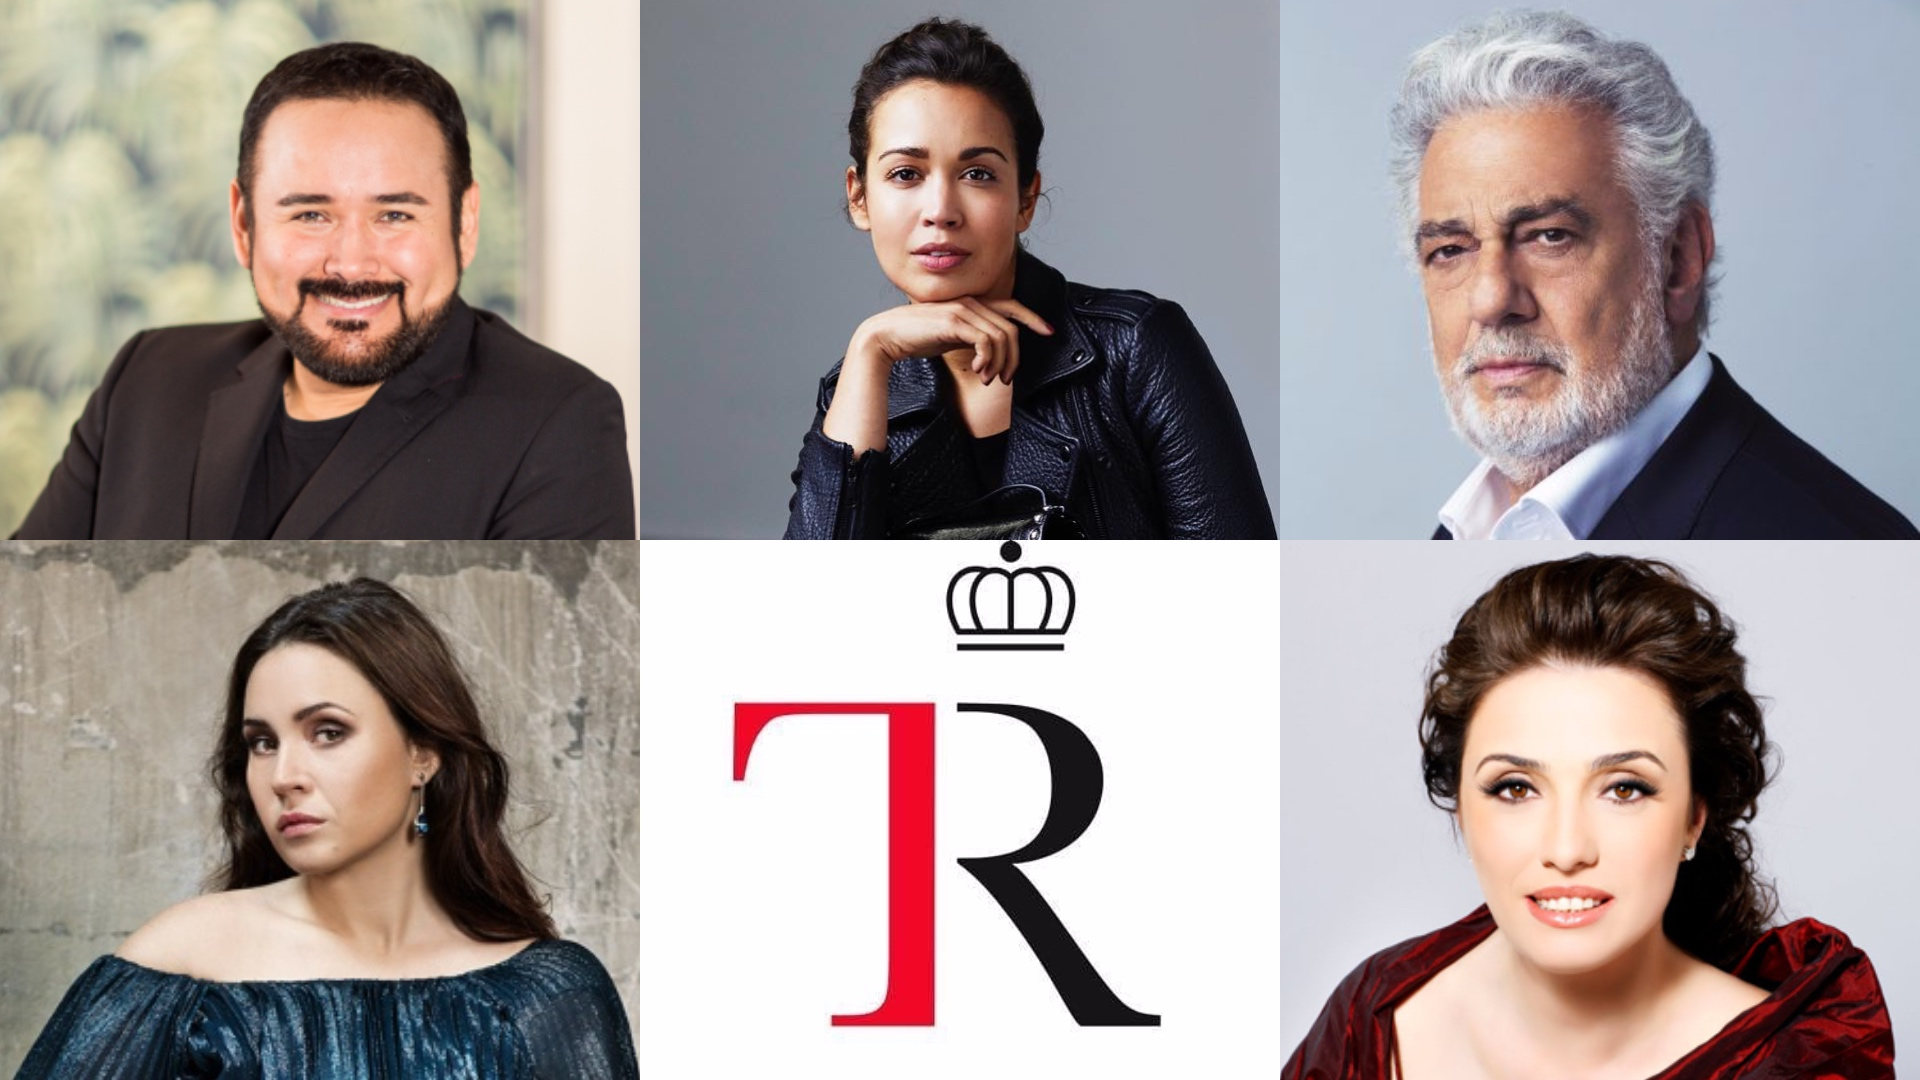 Teatro Real Madrid; Teatro Real; Madrid; TeatroRealMadrid1920; Opera; Javier Camarena; Nadine Sierra; Placido Domingo; Sonya Yoncheva; Ermonela Jaho